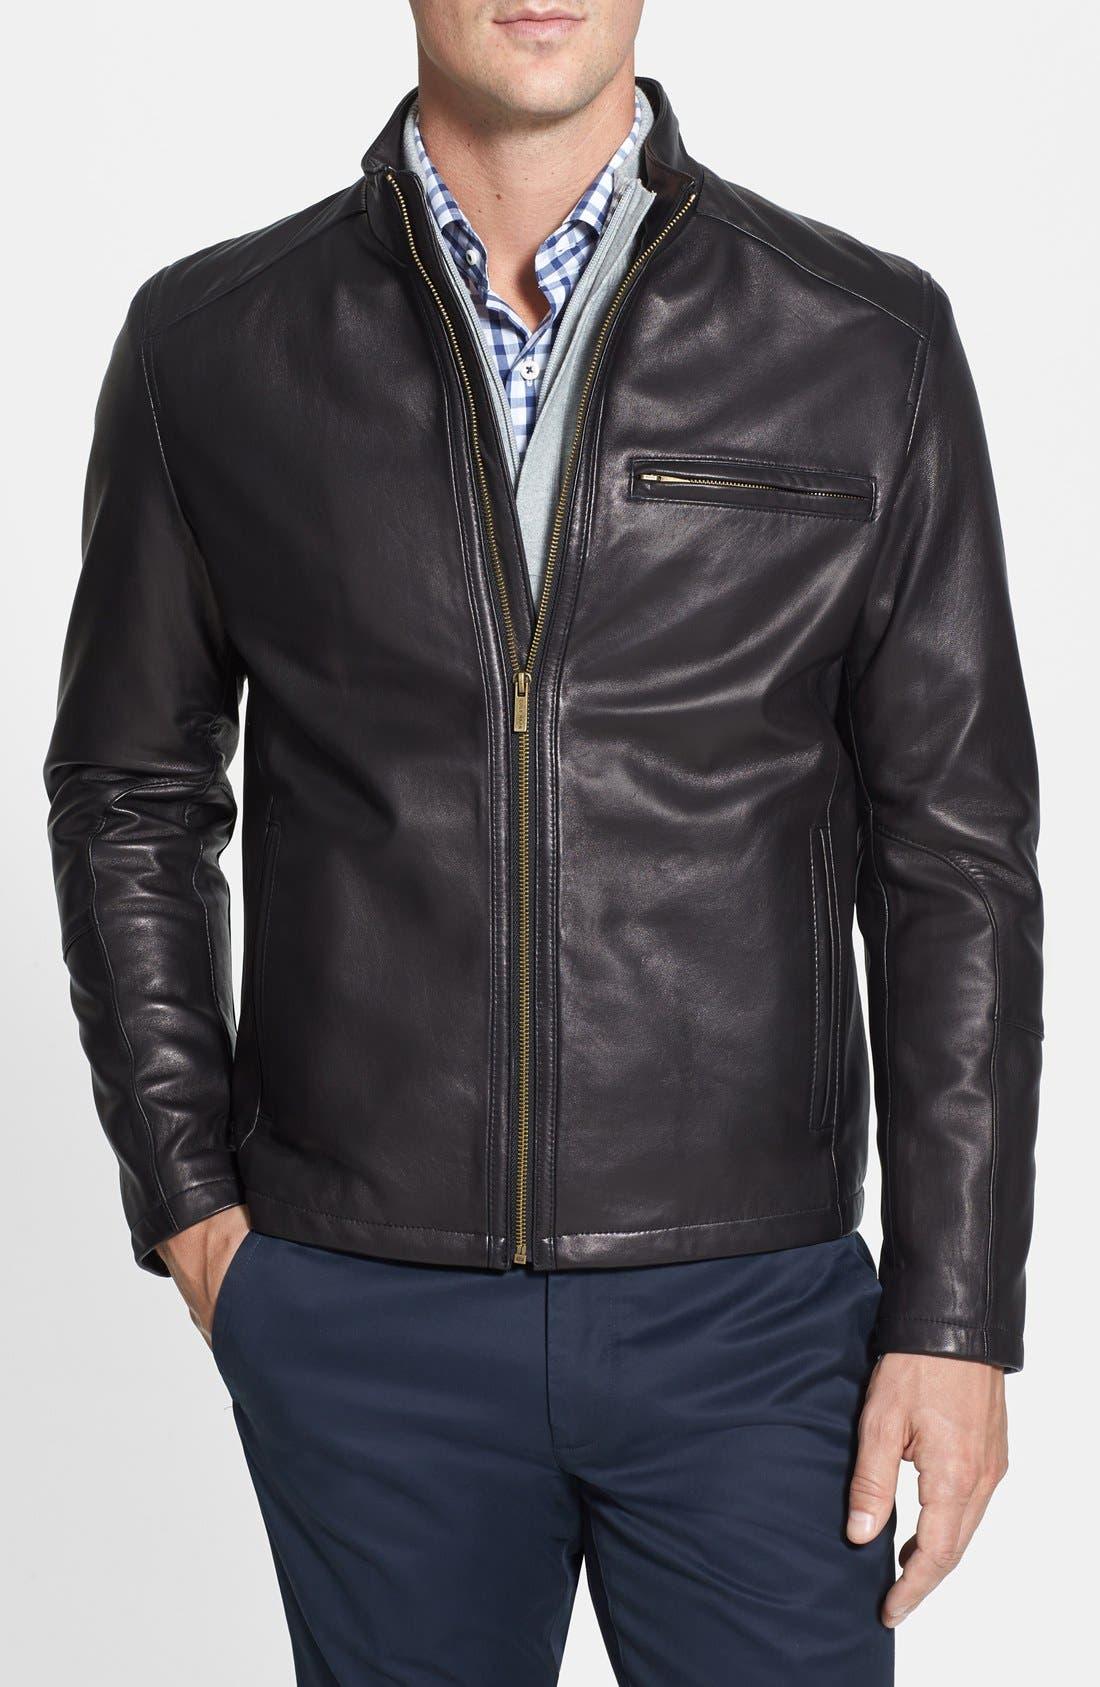 COLE HAAN, Lambskin Leather Moto Jacket, Main thumbnail 1, color, BLACK